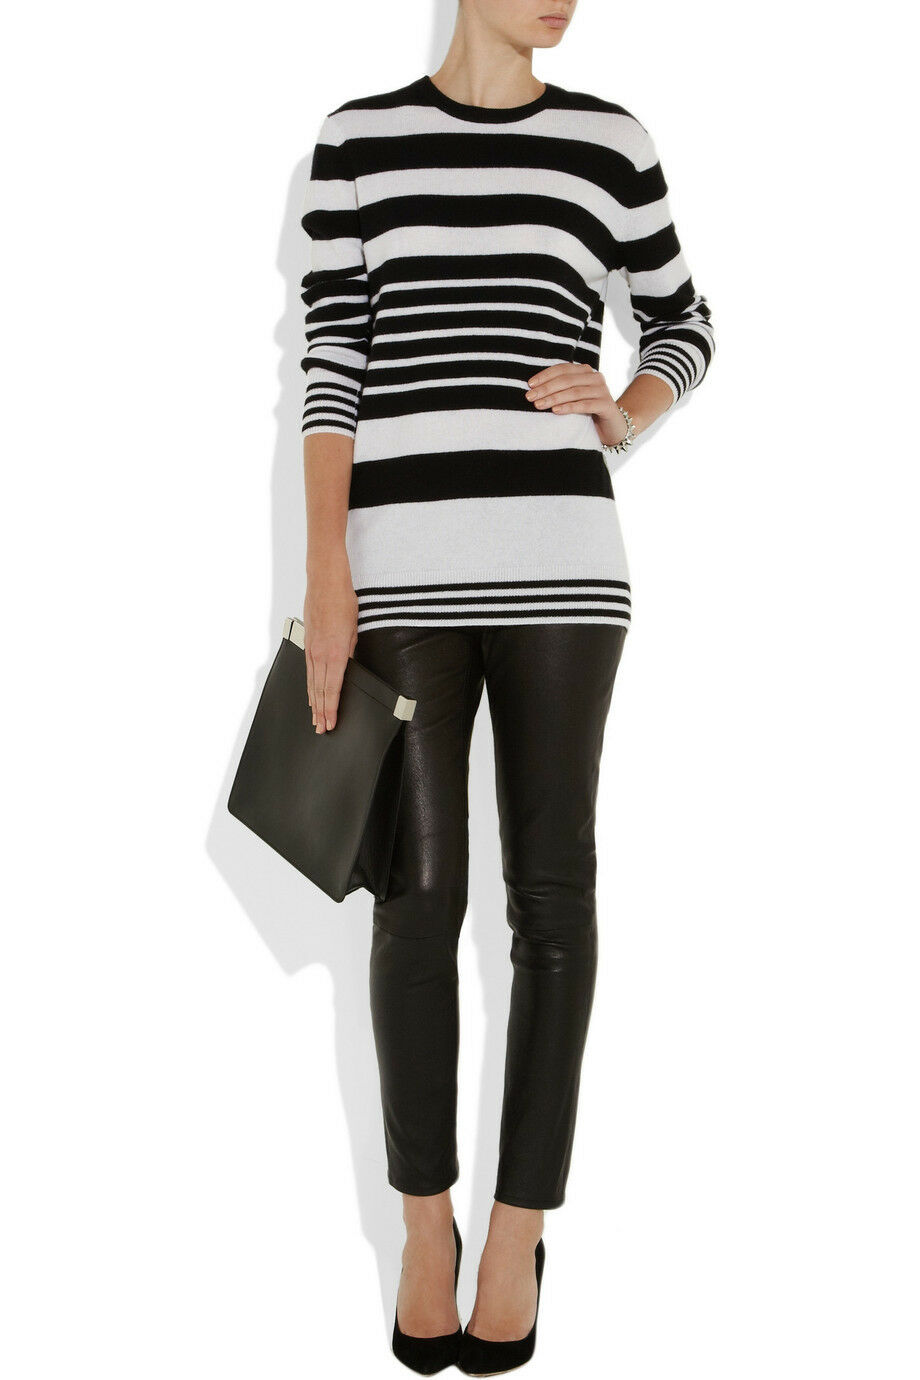 275 Equipment REI Red Ivory Cashmere Stripe Boyfriend Tunic Sweater S P